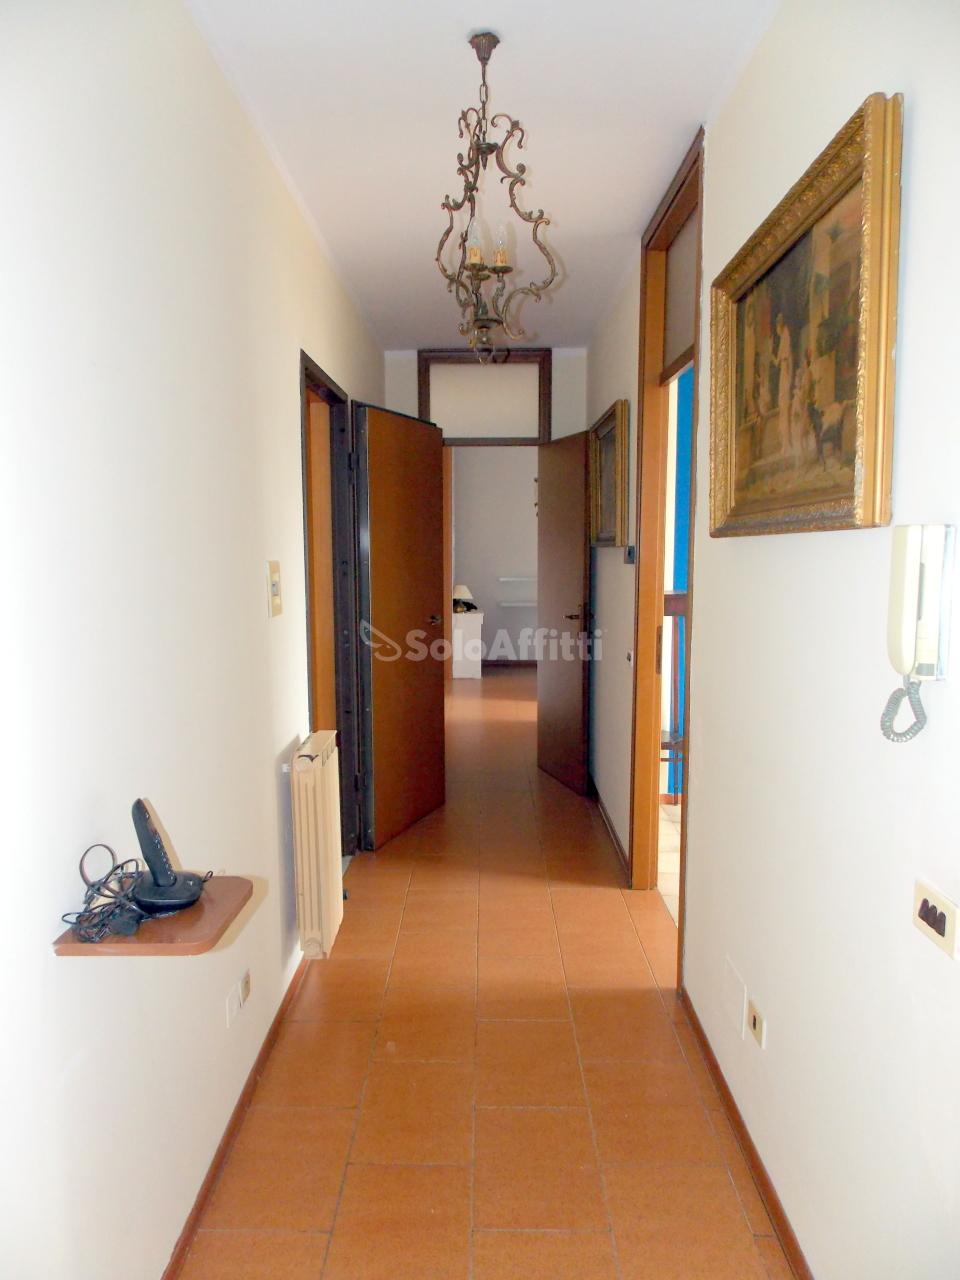 Bilocale Novara Via Laurana  8 3